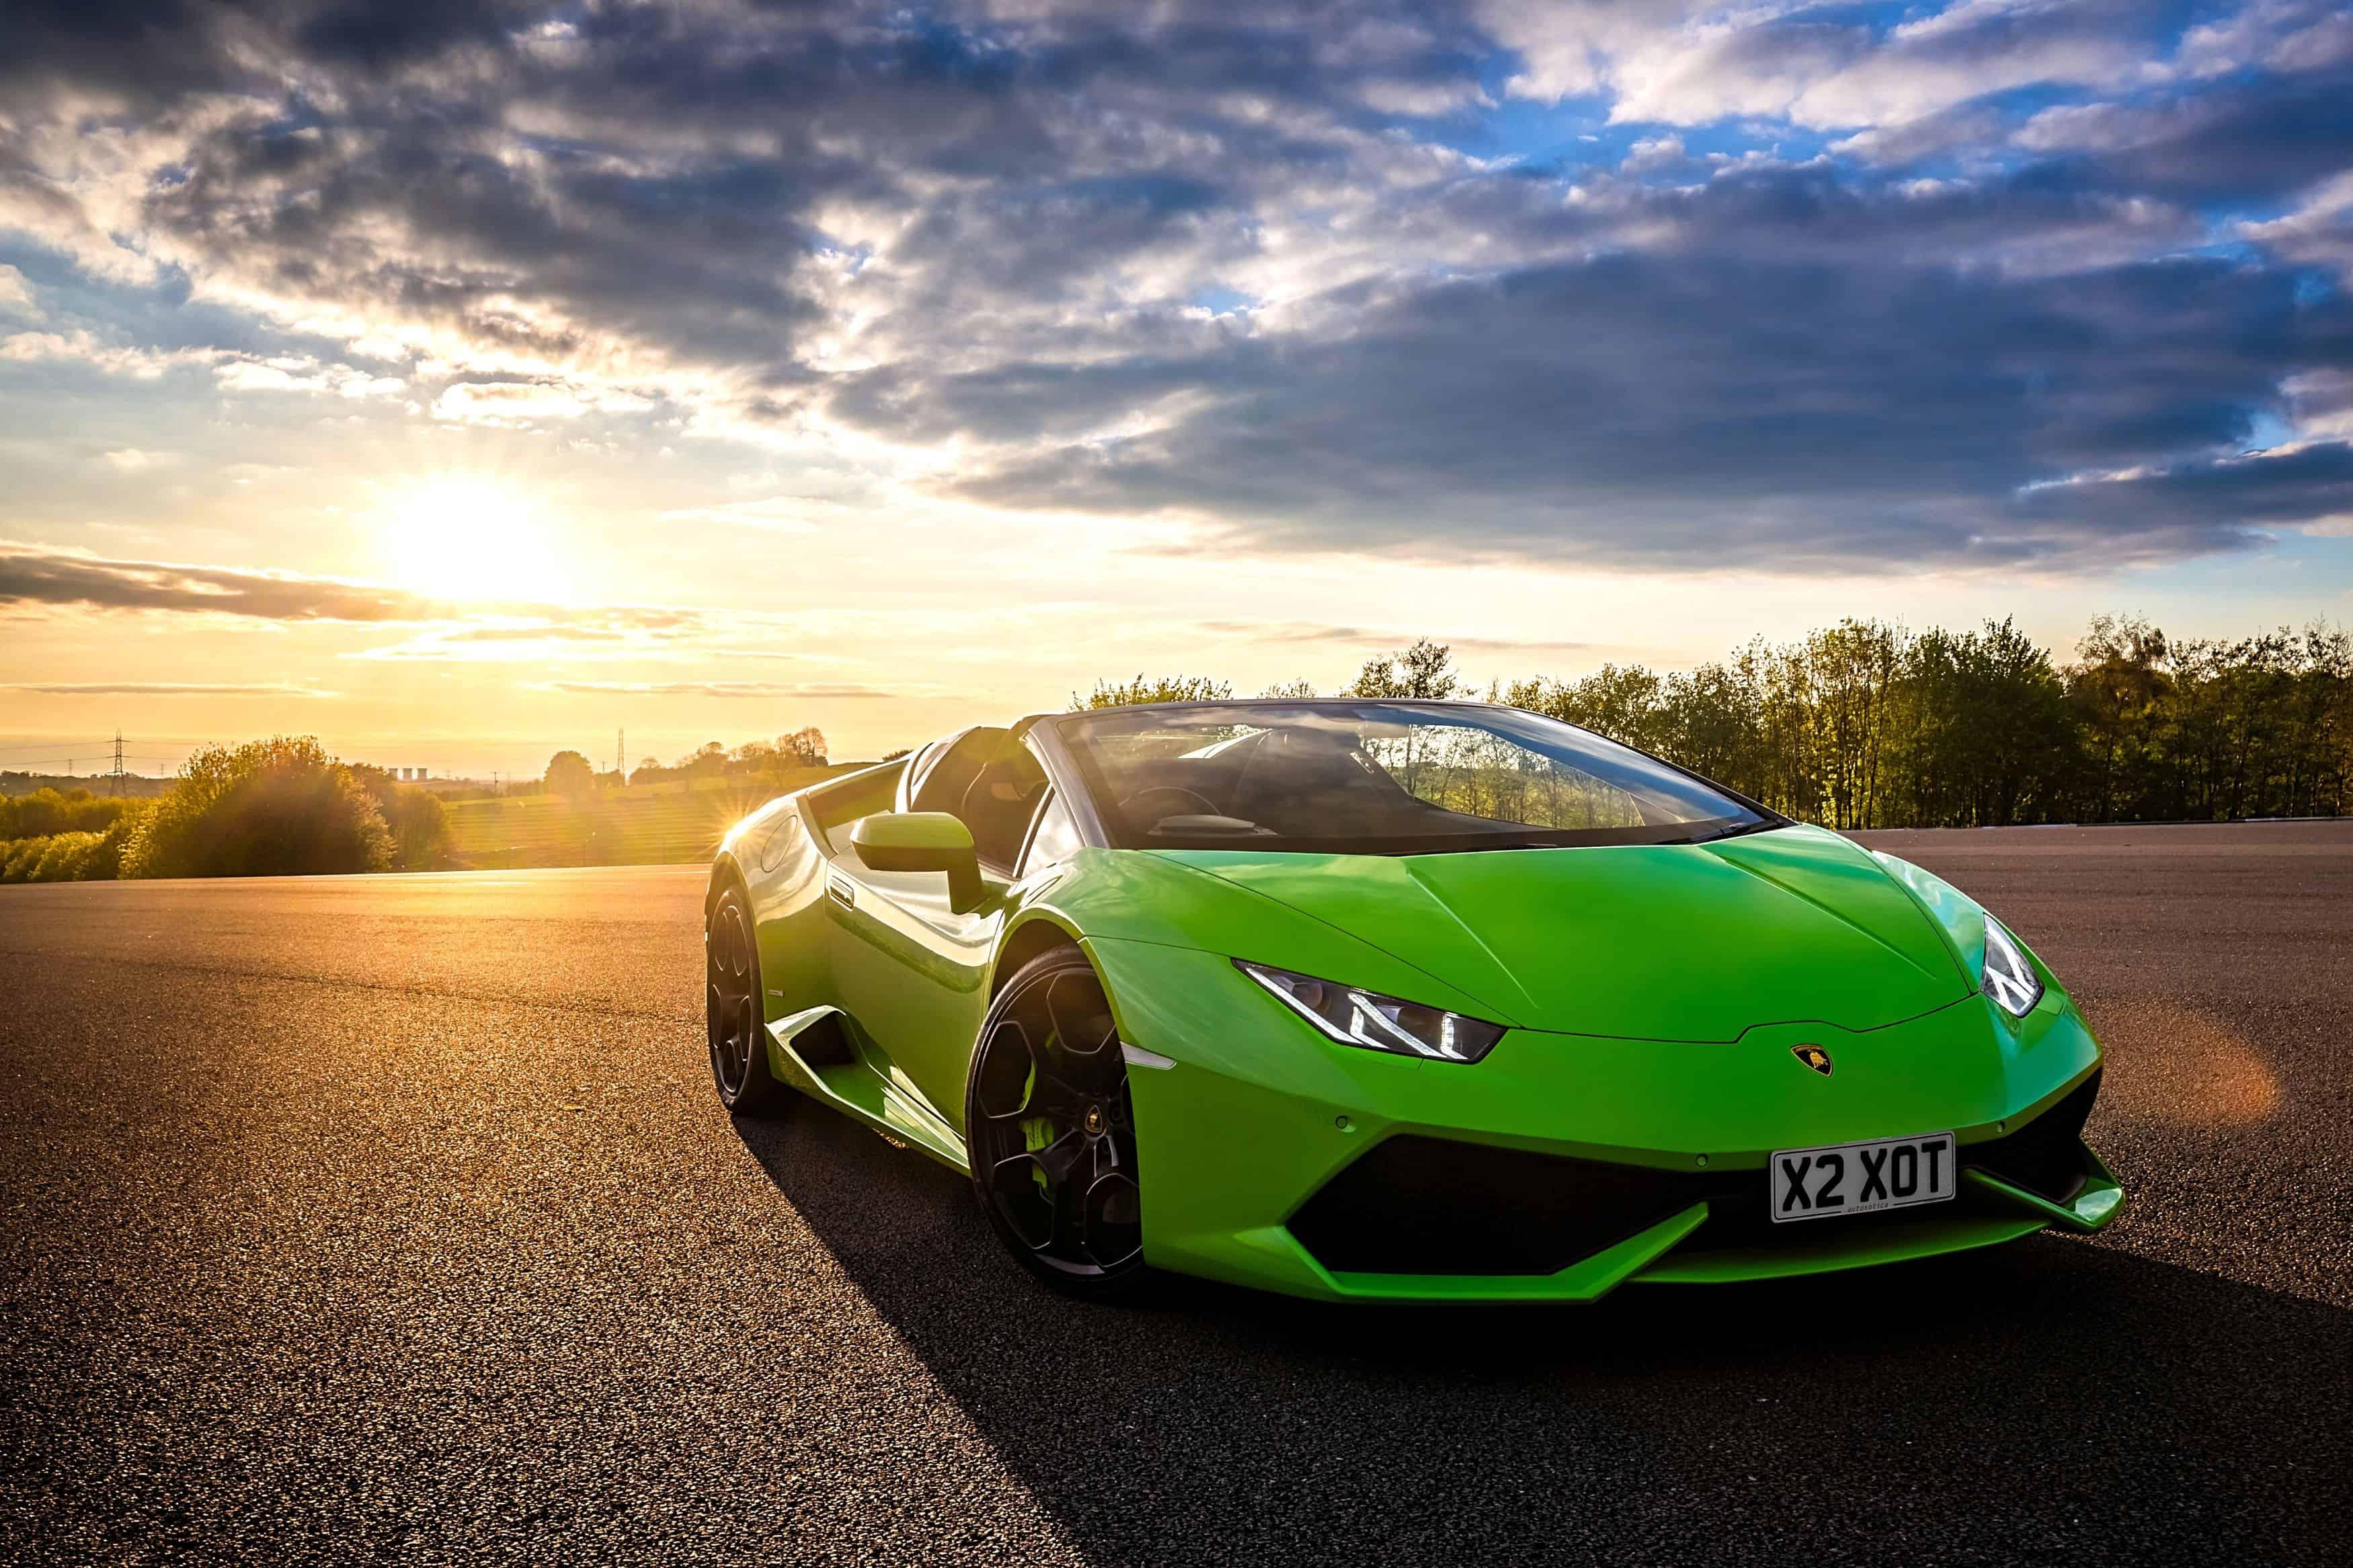 Lamborghini Huracan Spyder Sunset